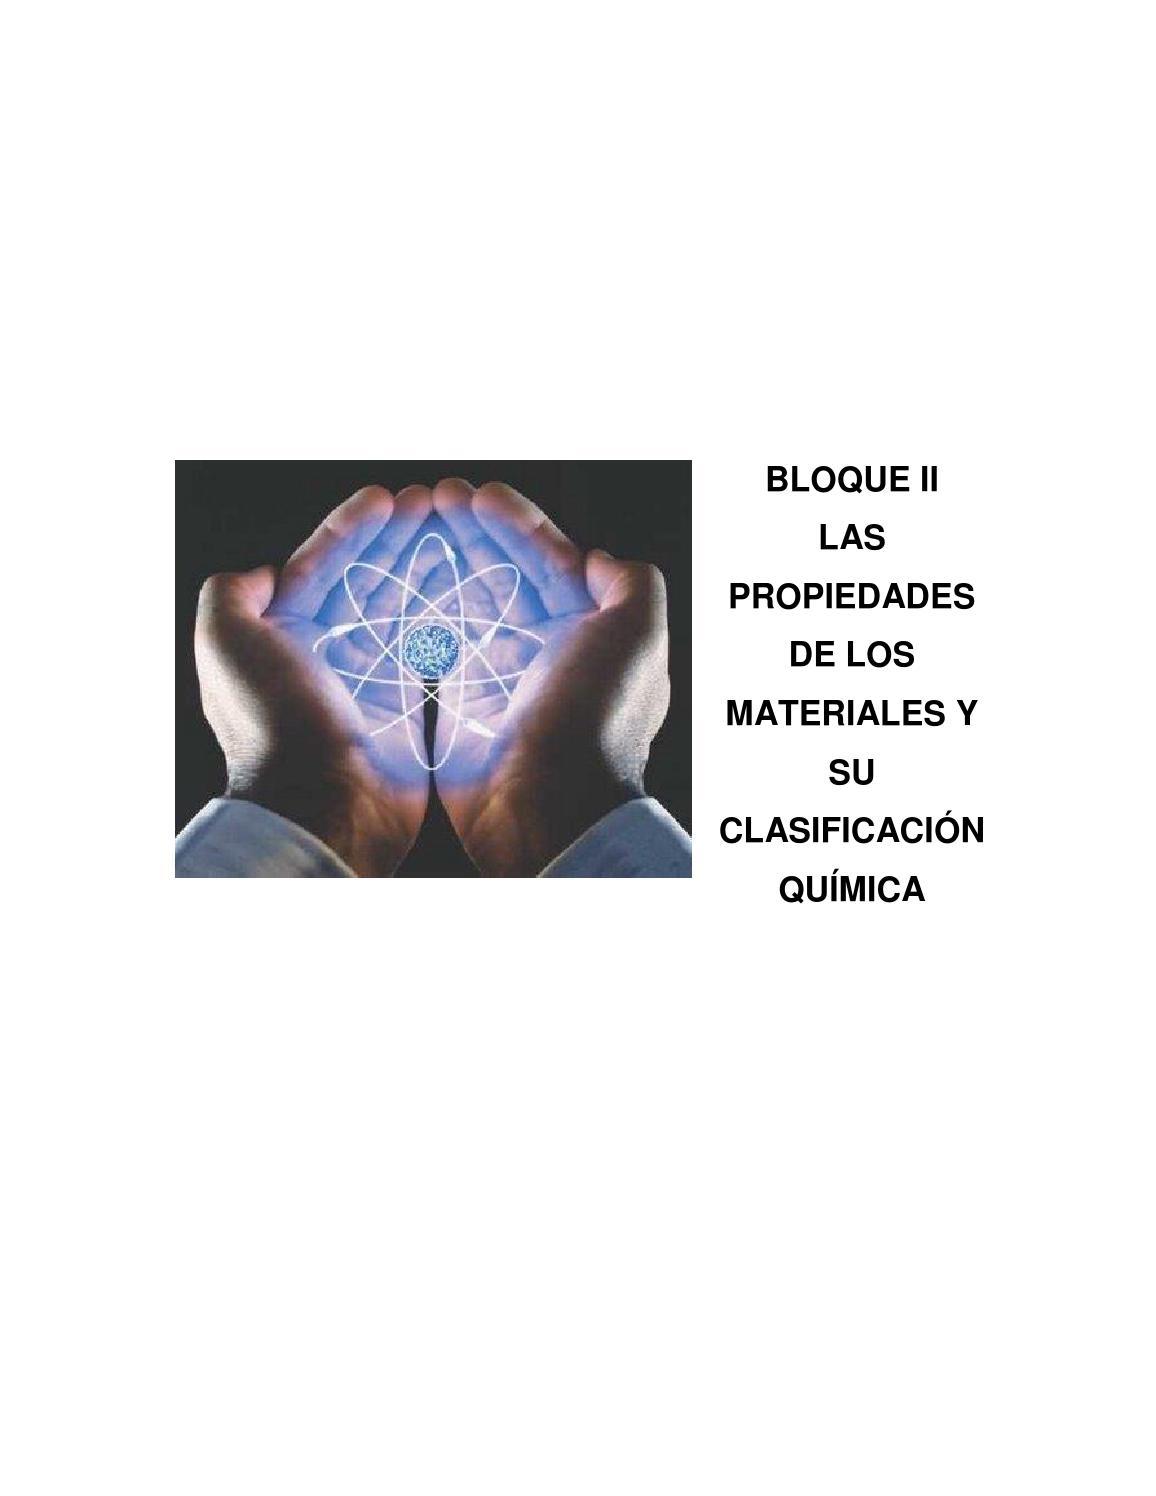 Bloque 1 y 2 de quimica by lorena issuu urtaz Image collections